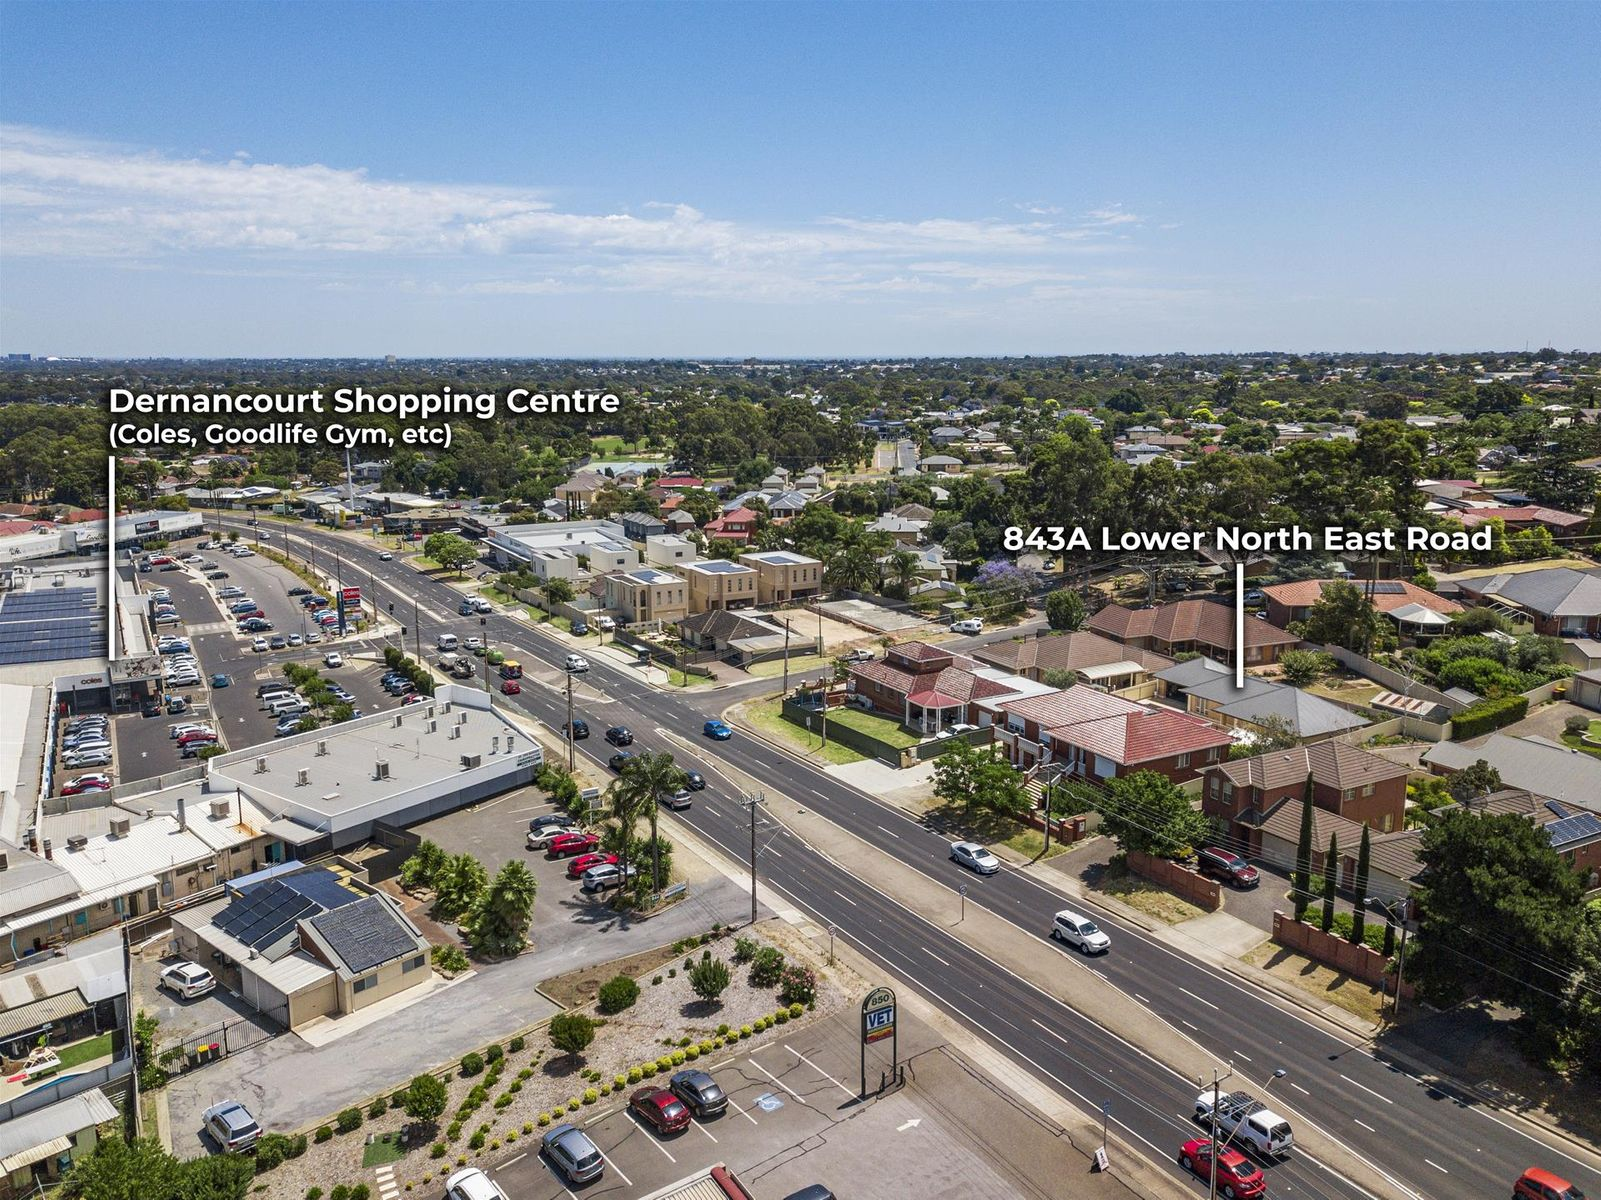 843a Lower North East Road, Dernancourt, SA 5075